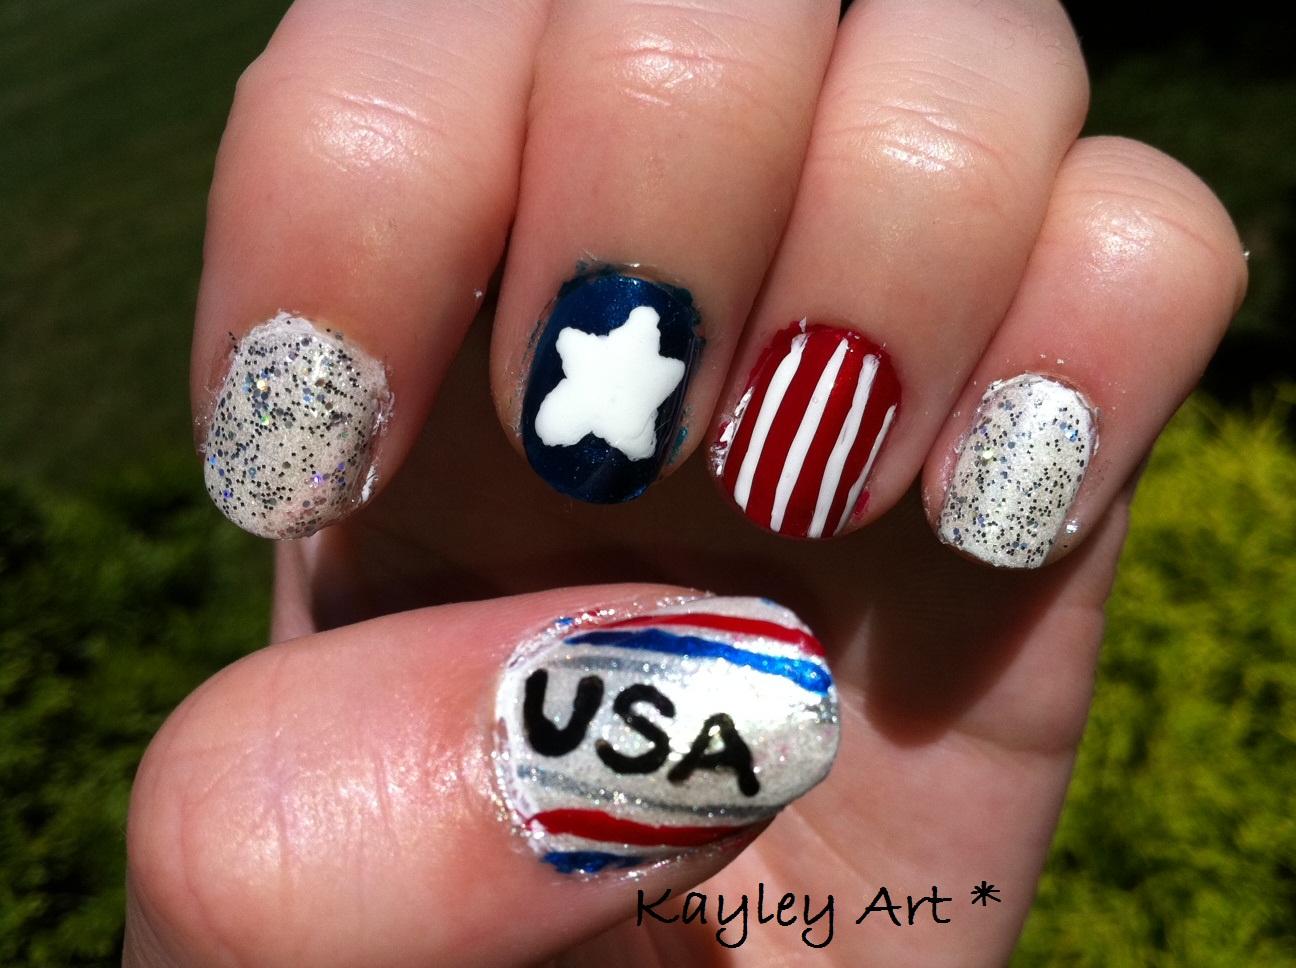 Nail art idea cute 4th july nail art kayleys nail art 4th of july nails solutioingenieria Gallery